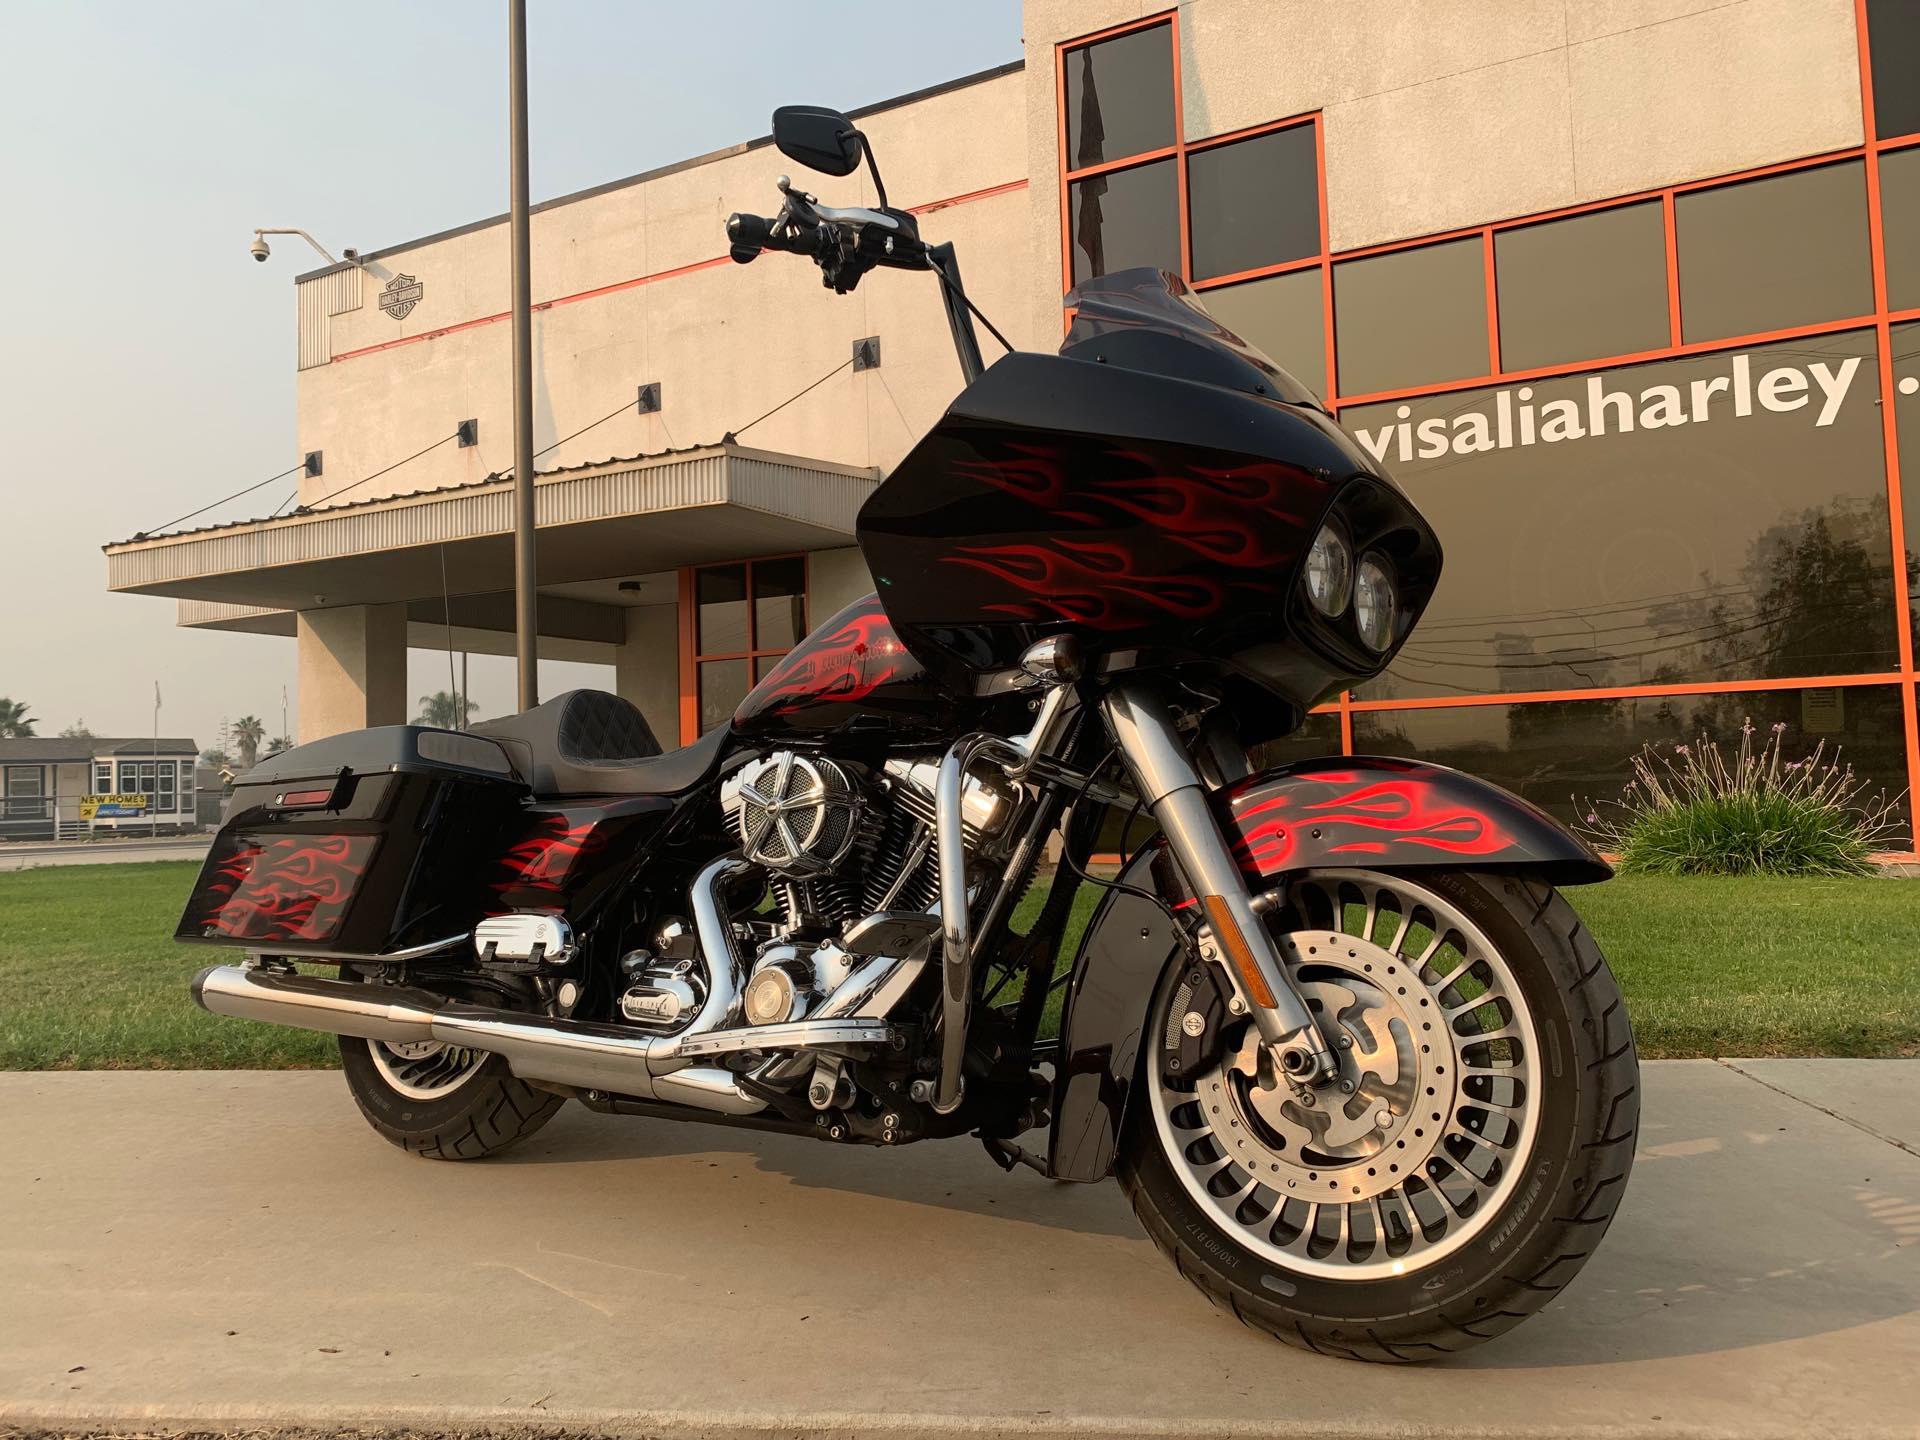 2009 Harley-Davidson Road Glide Base at Visalia Harley-Davidson